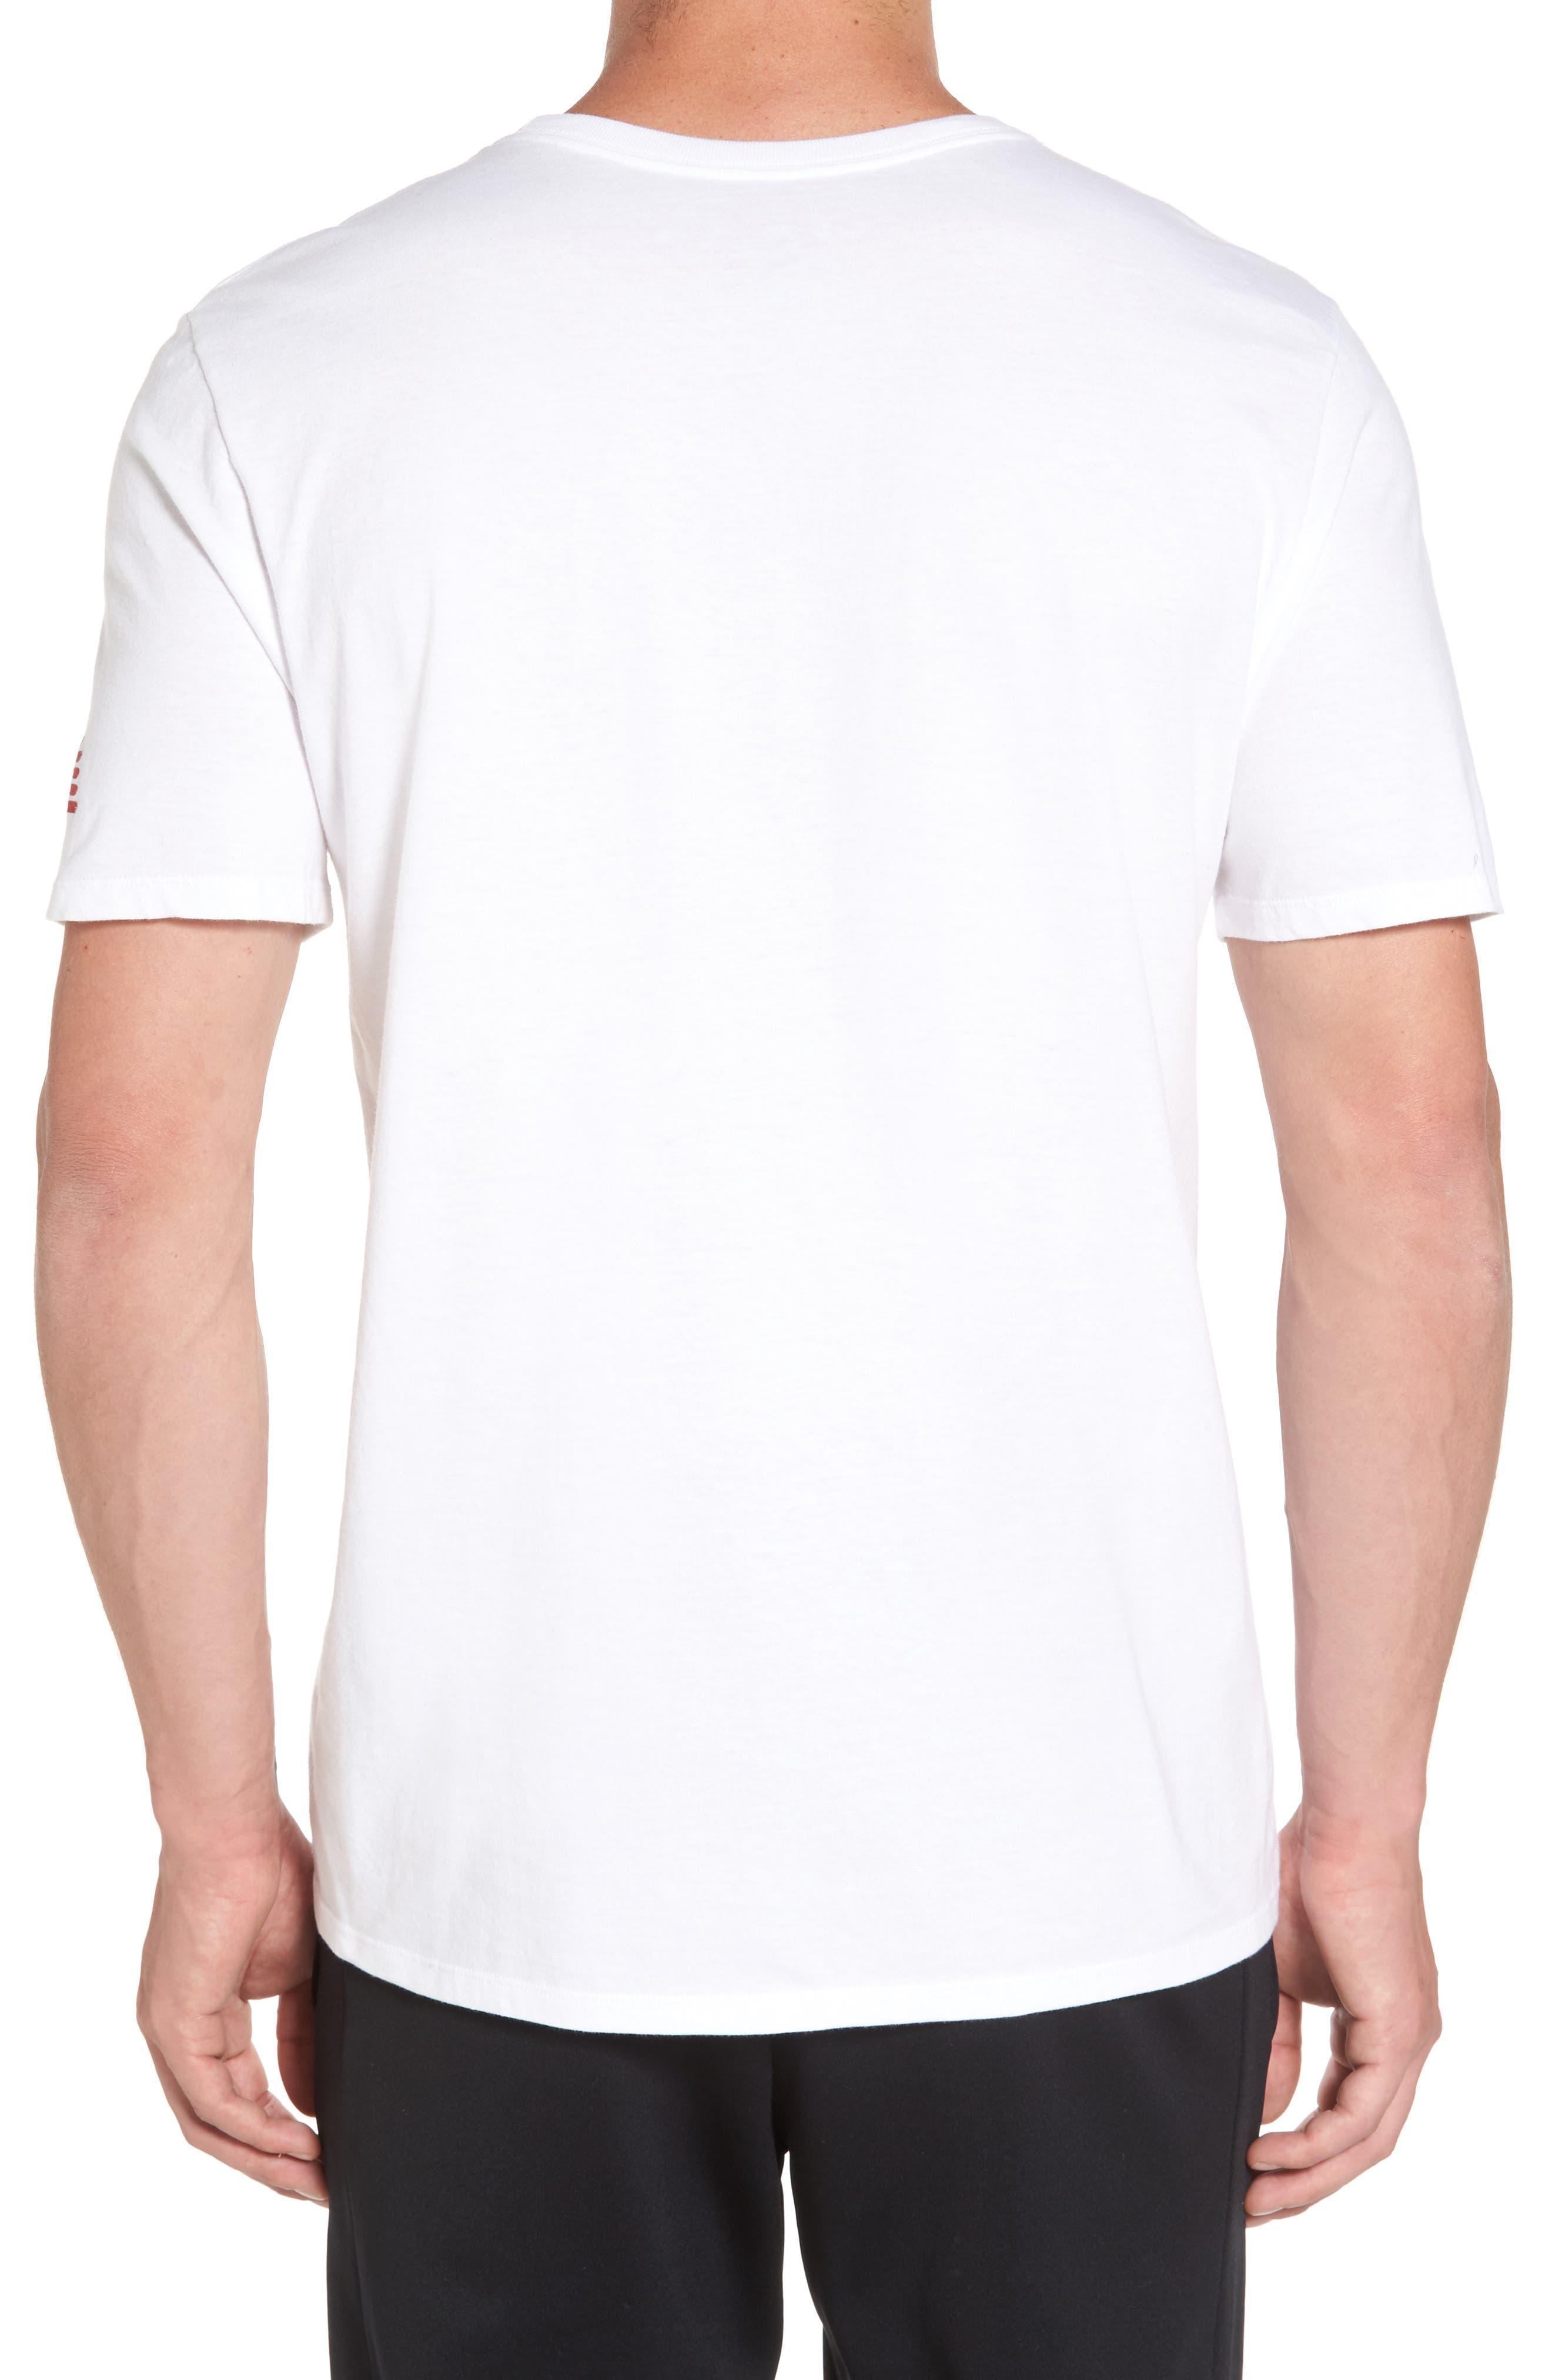 Sportswear Mars Blackmon T-Shirt,                             Alternate thumbnail 2, color,                             White